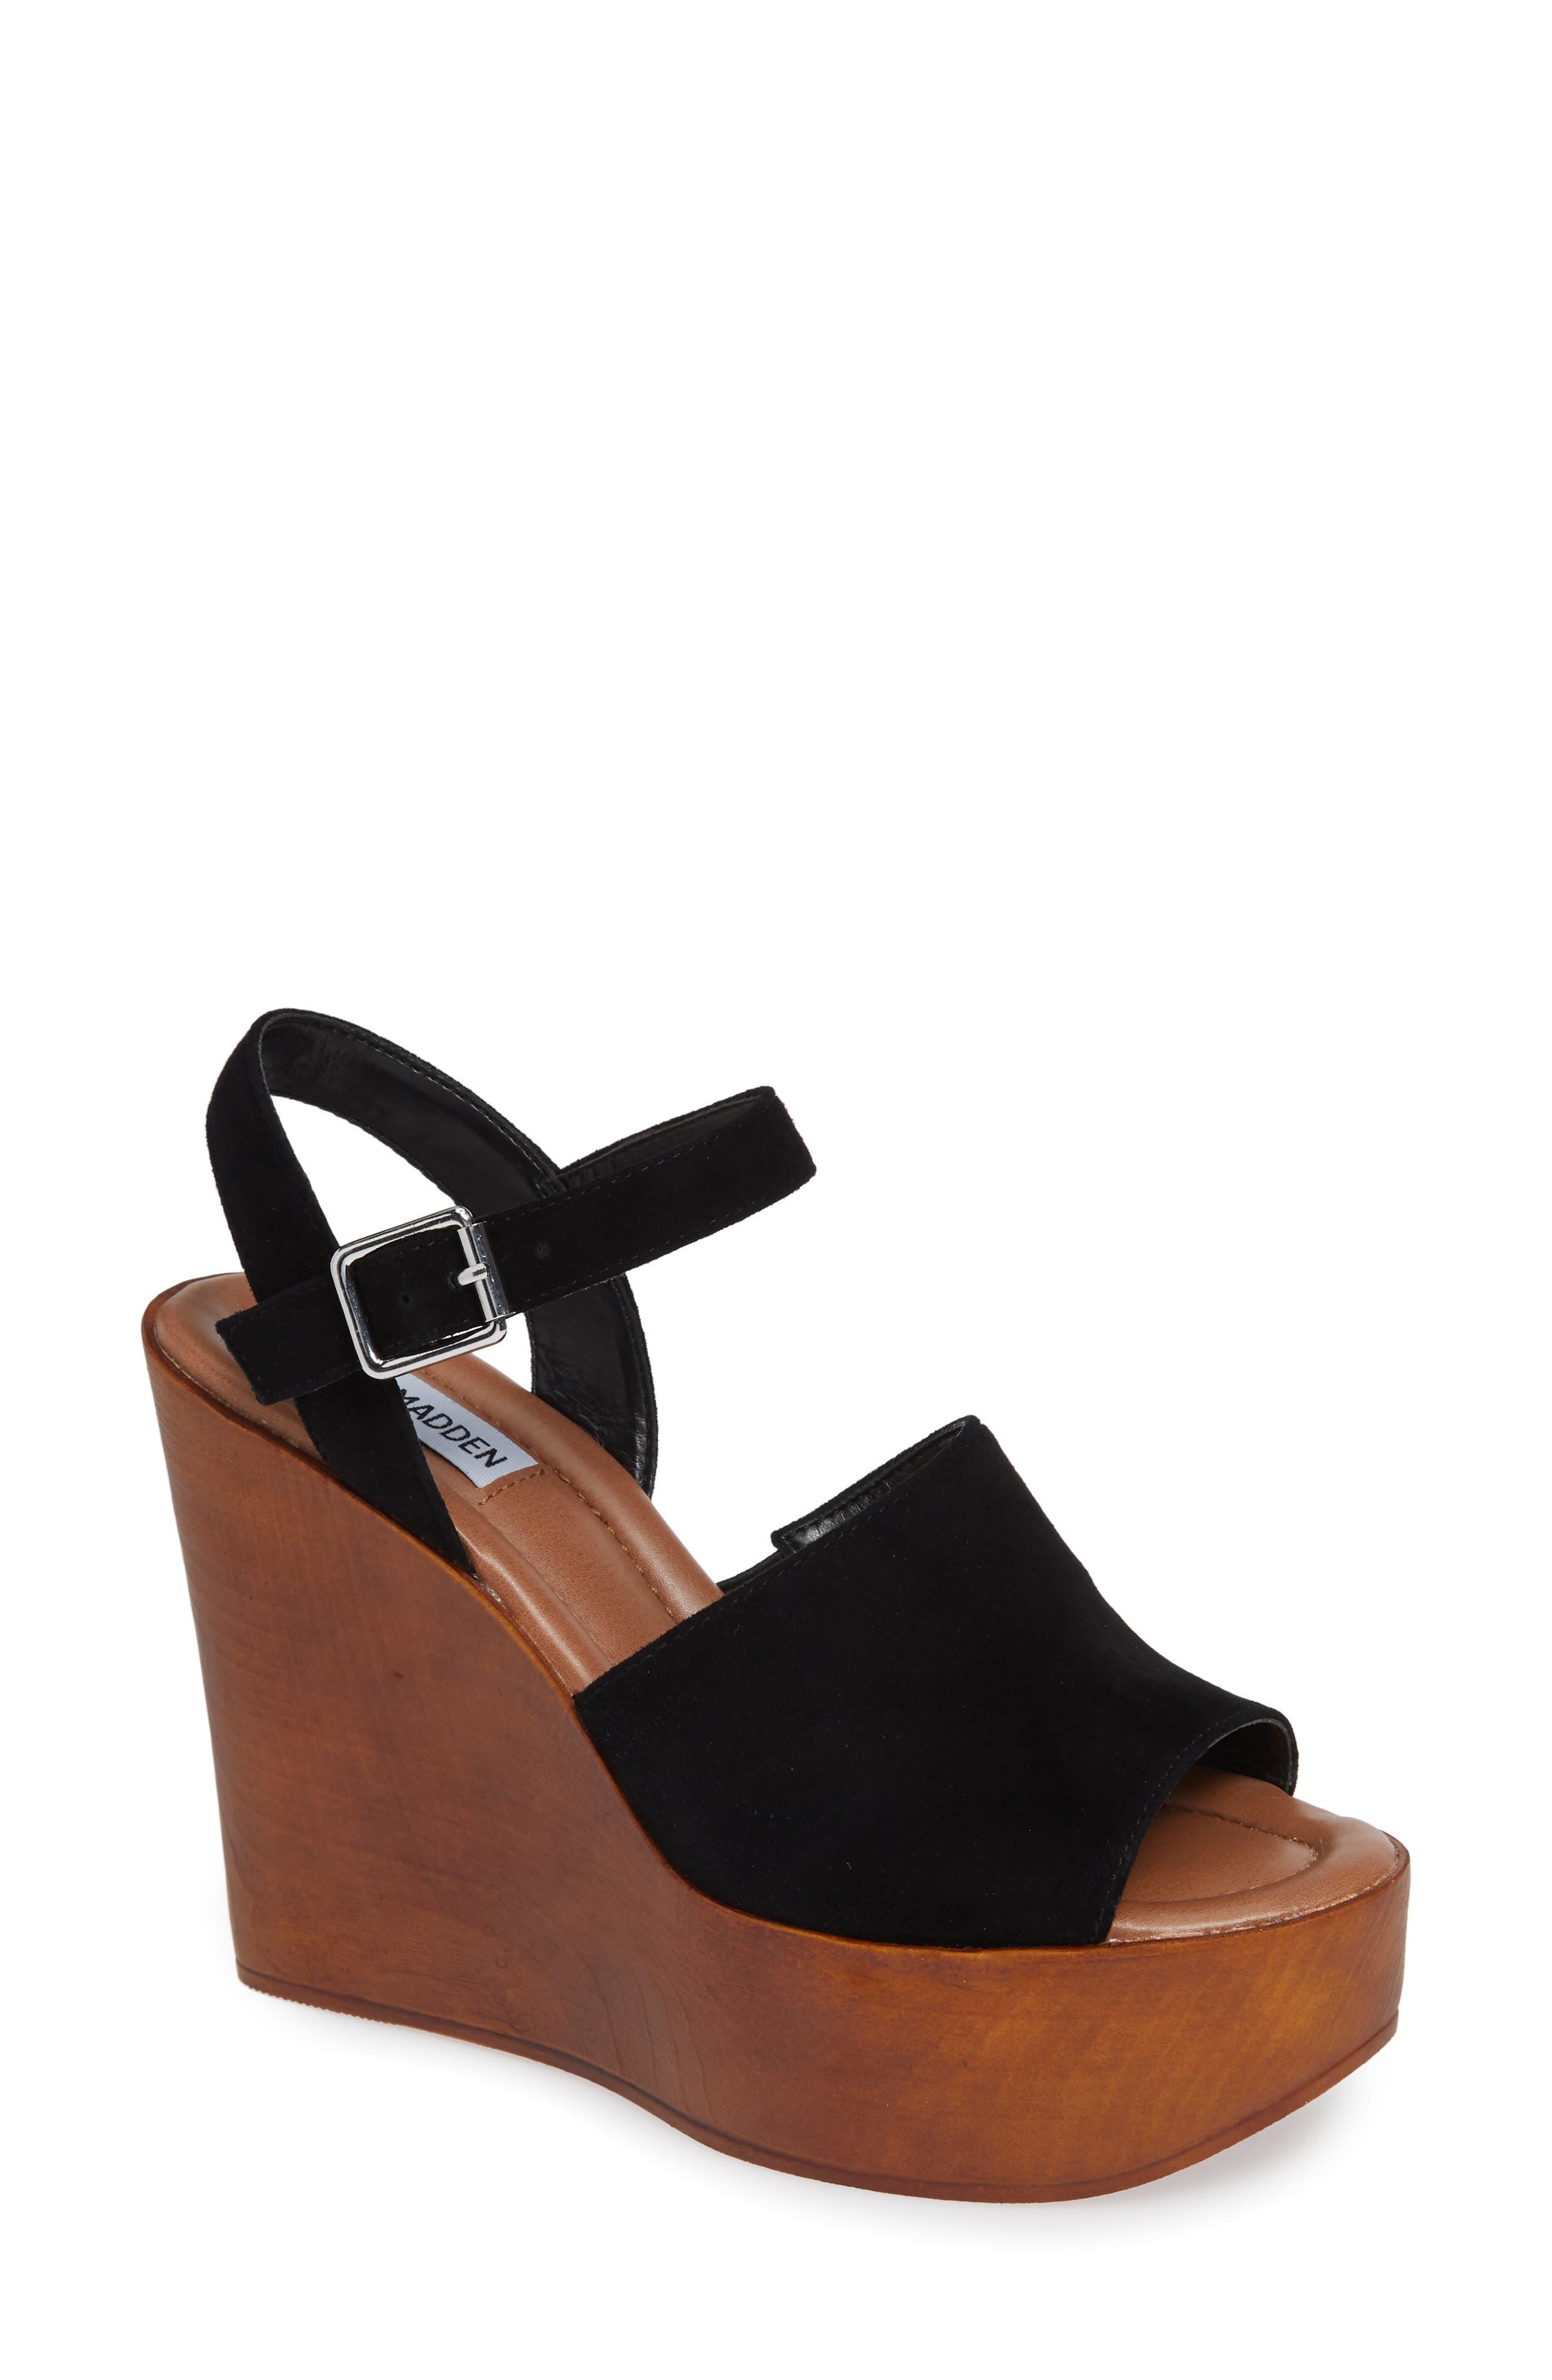 Bellini Wedge Sandal,                         Main,                         color, BLACK SUEDE